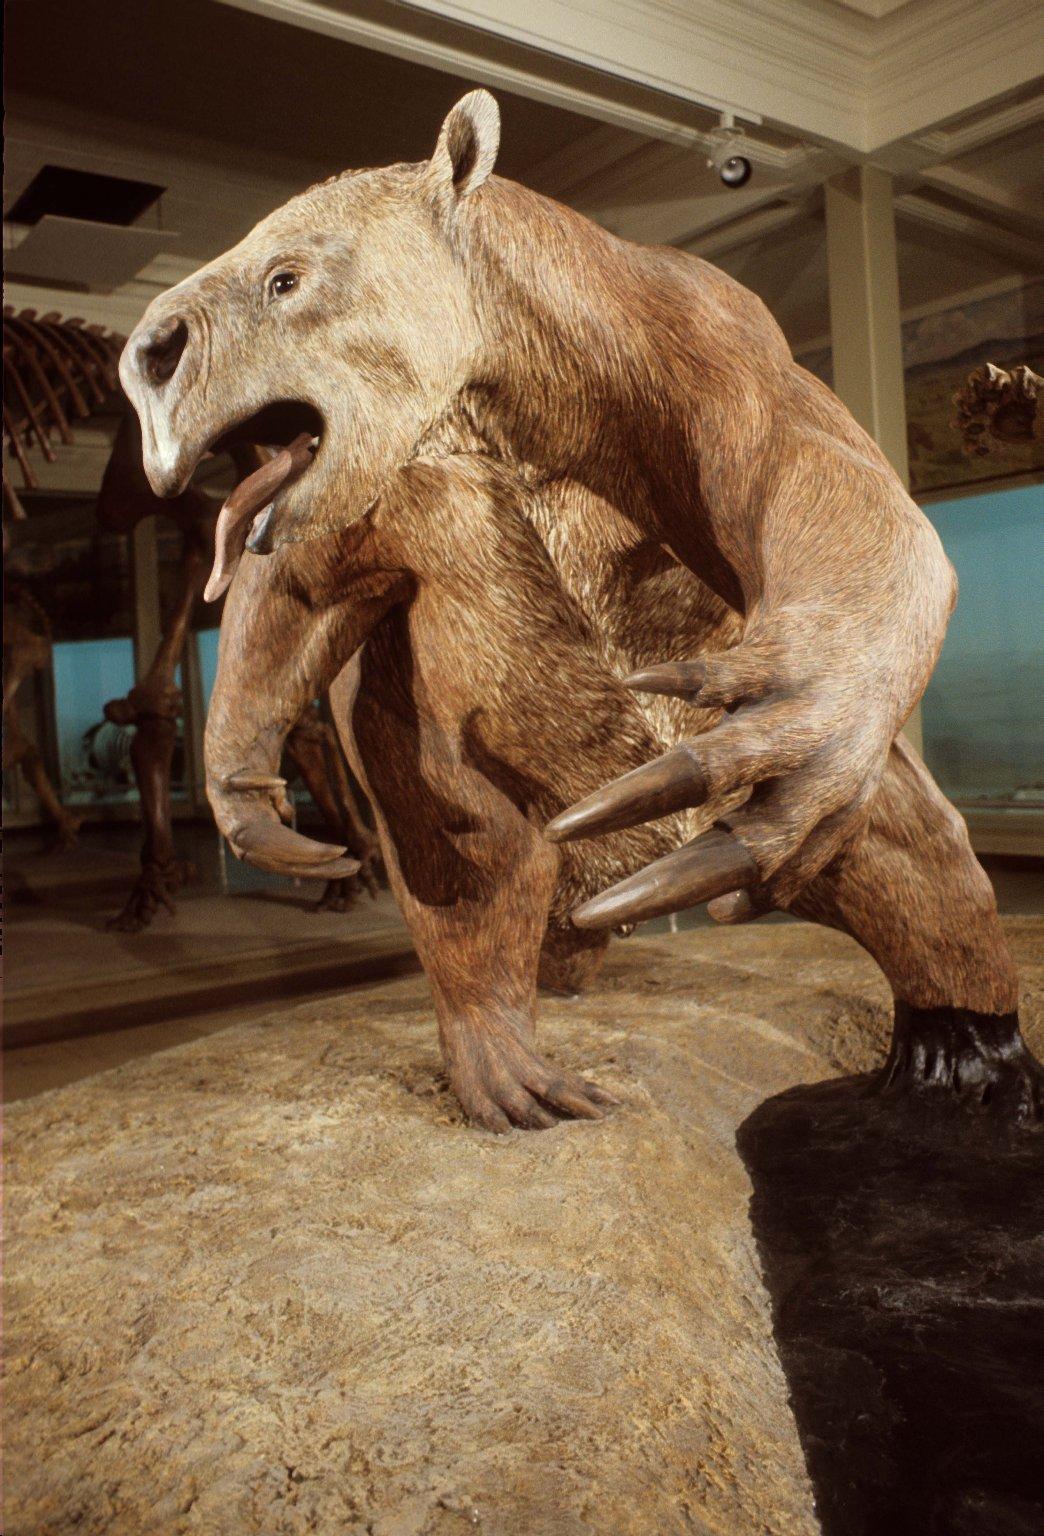 Giant Sloth from La Brea Tar Pit exhibit